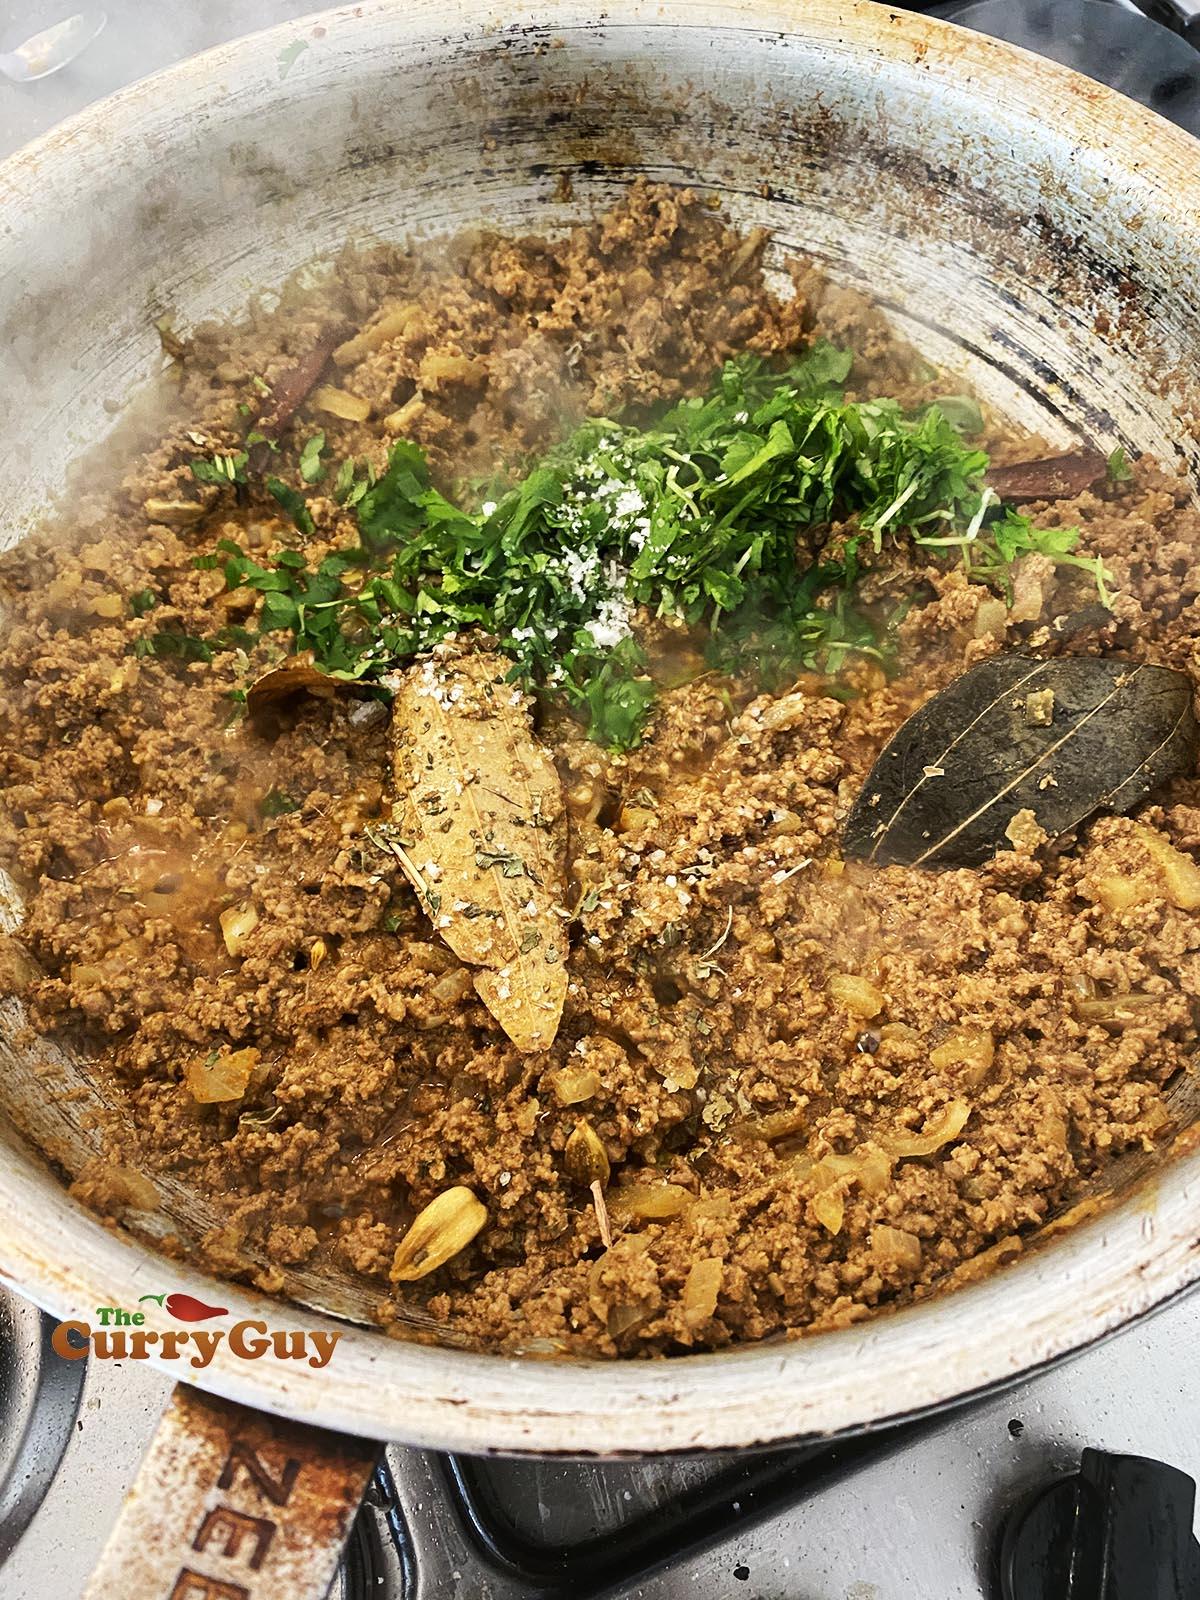 Adding coriander (cilantro) and kasoori methi to the pan.